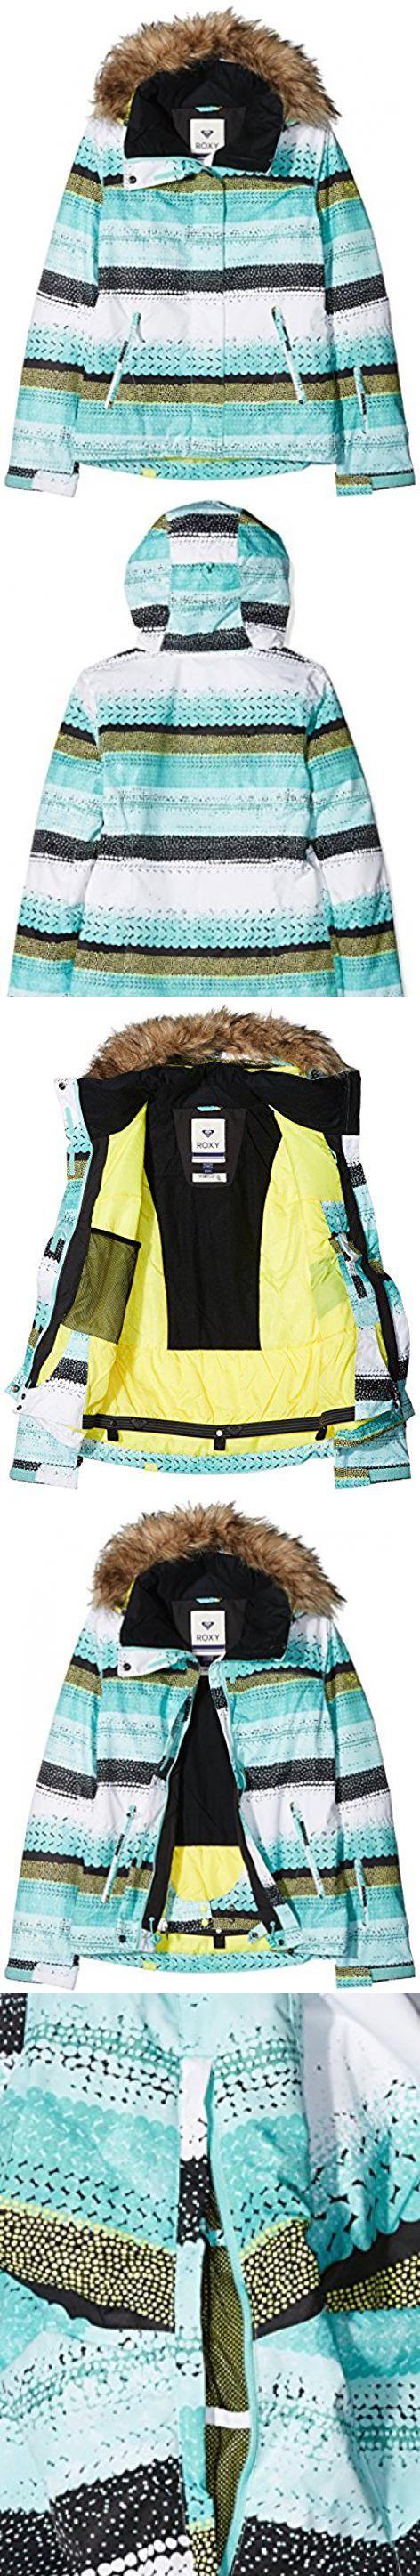 Roxy Jet Ski Snow Jacket Aruba Blue Lizzy Dots Medium Apparel Sporting Goods Snow Jacket Jackets Vest Jacket